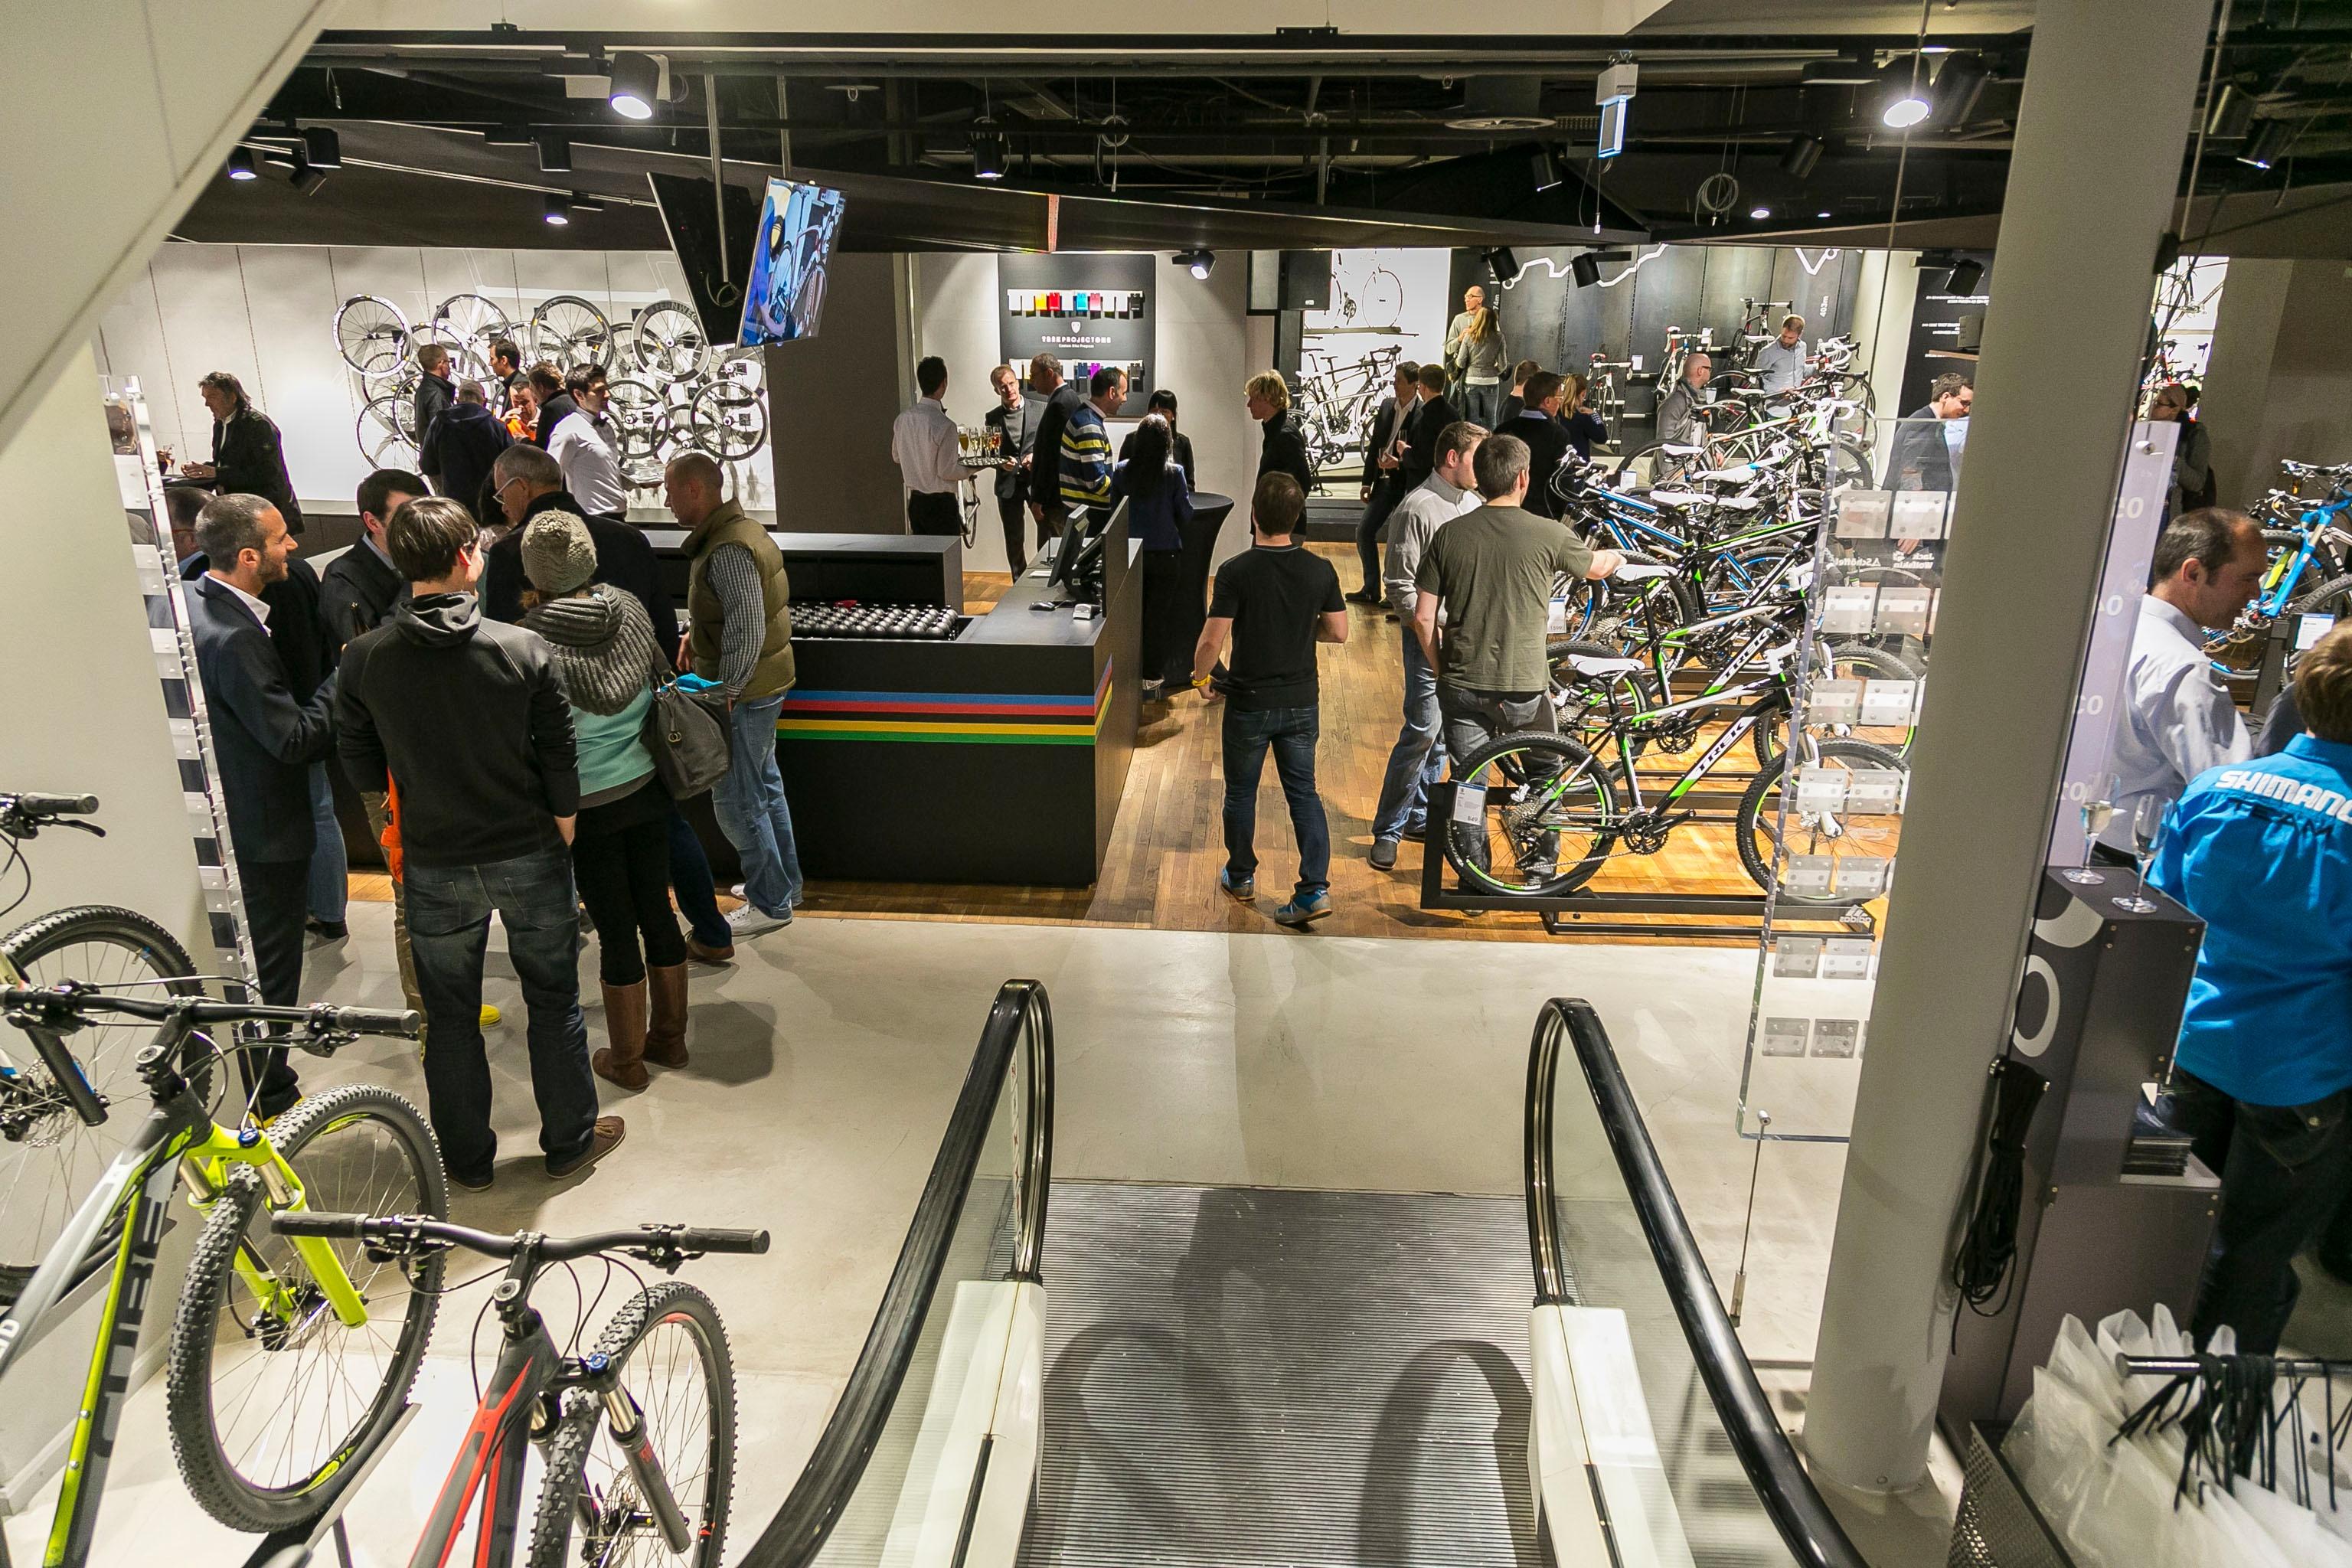 Le grand départ: Eröffnung der Bike-Abteilung